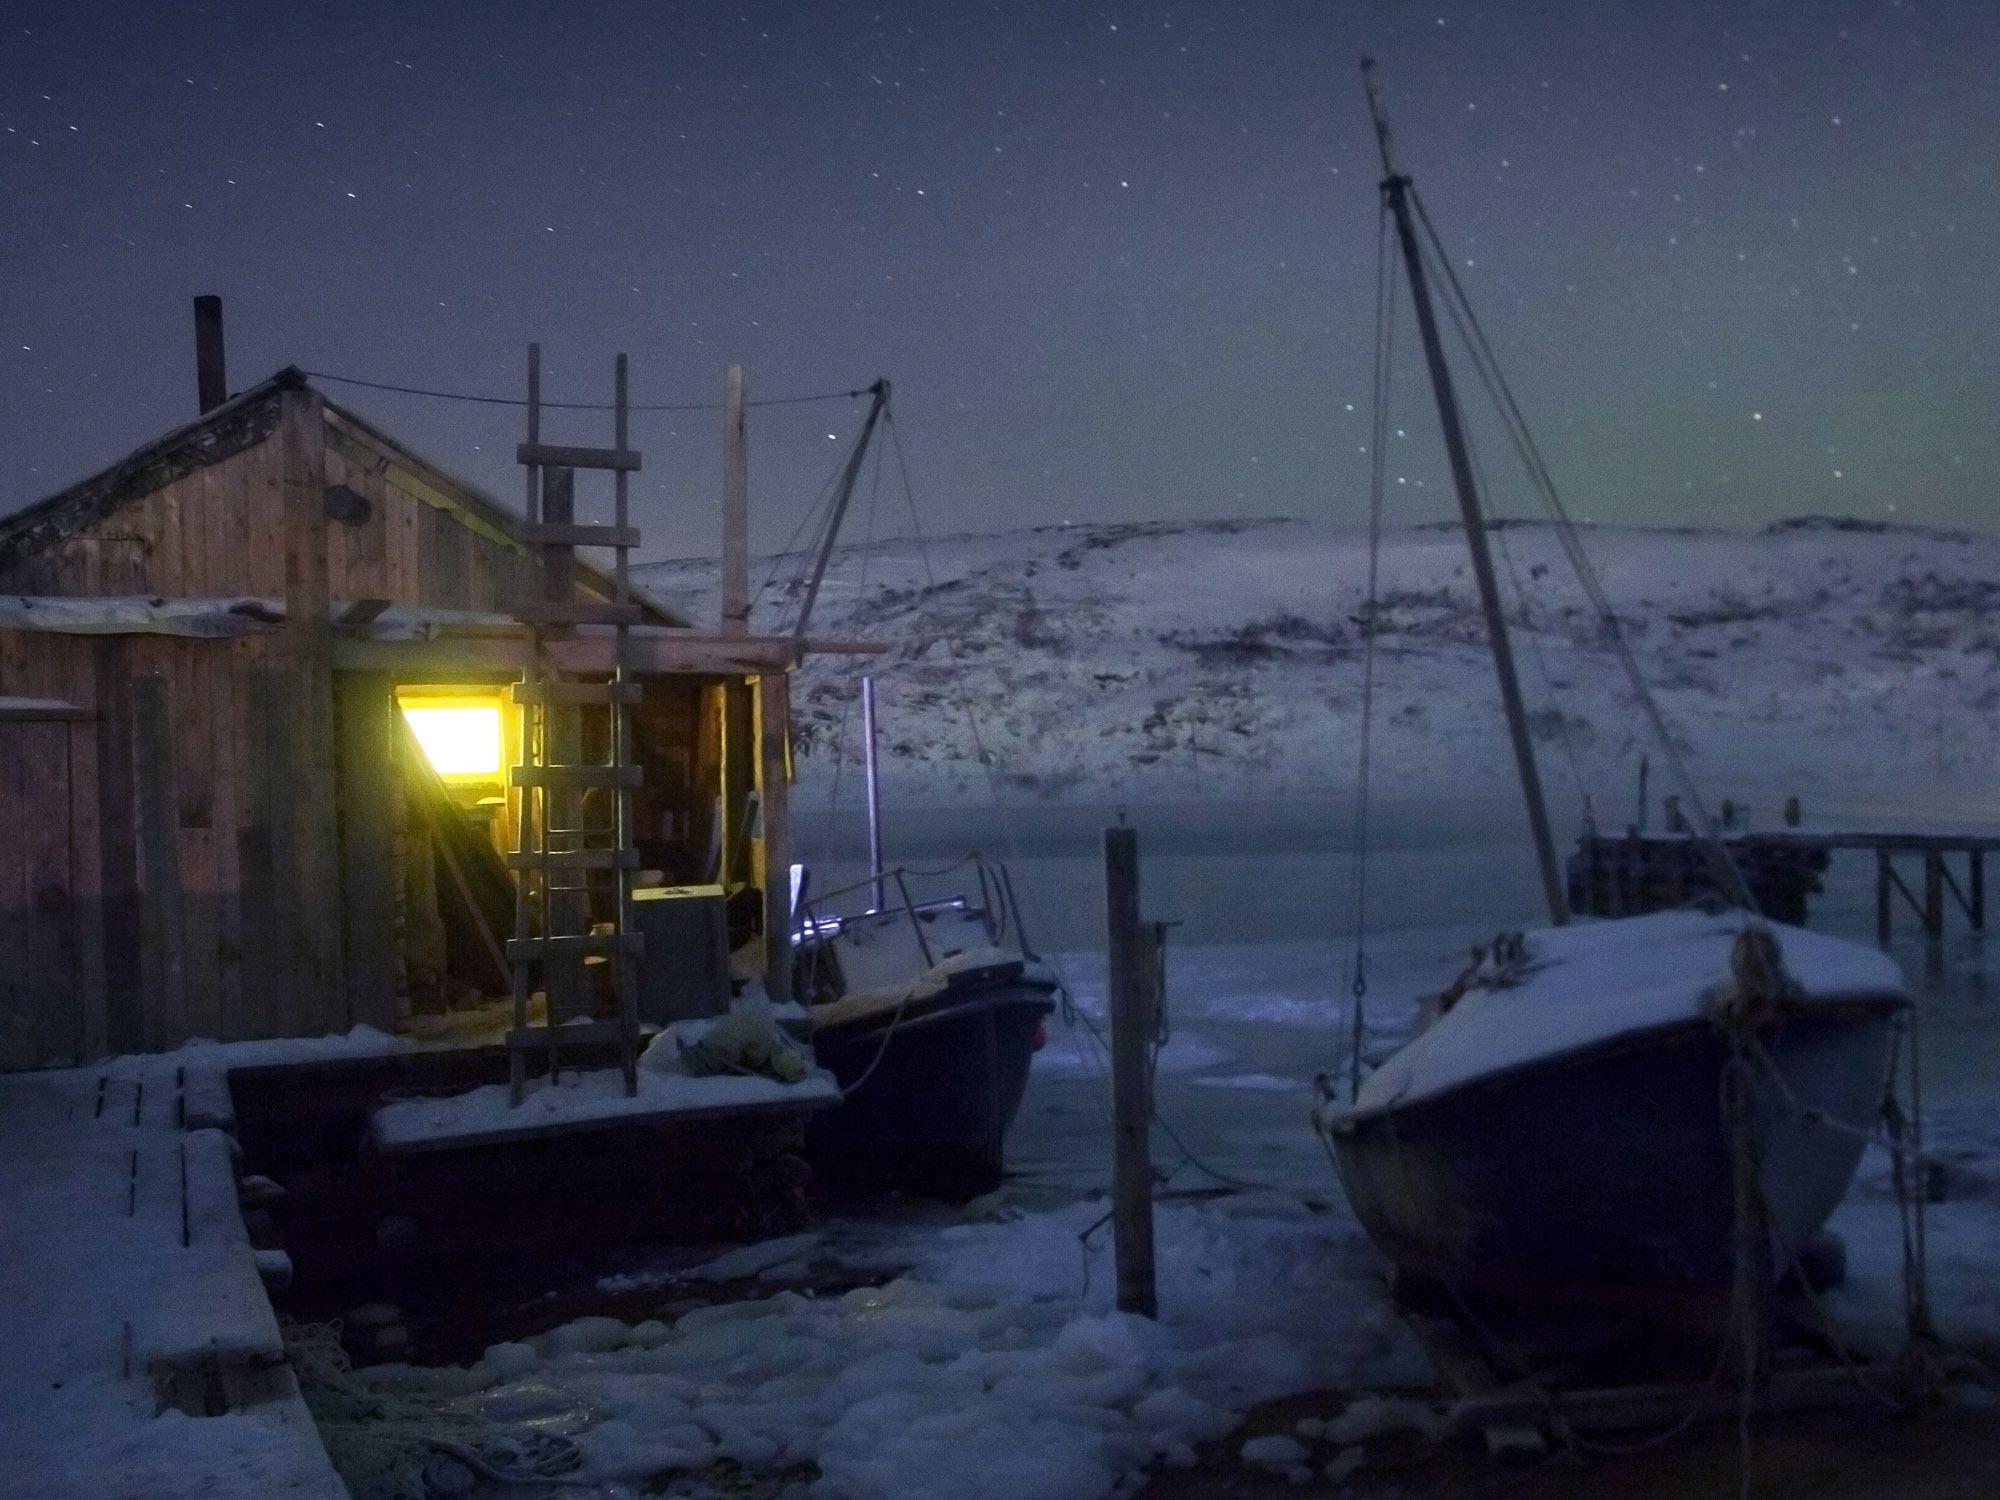 Photowalk across Murmansk